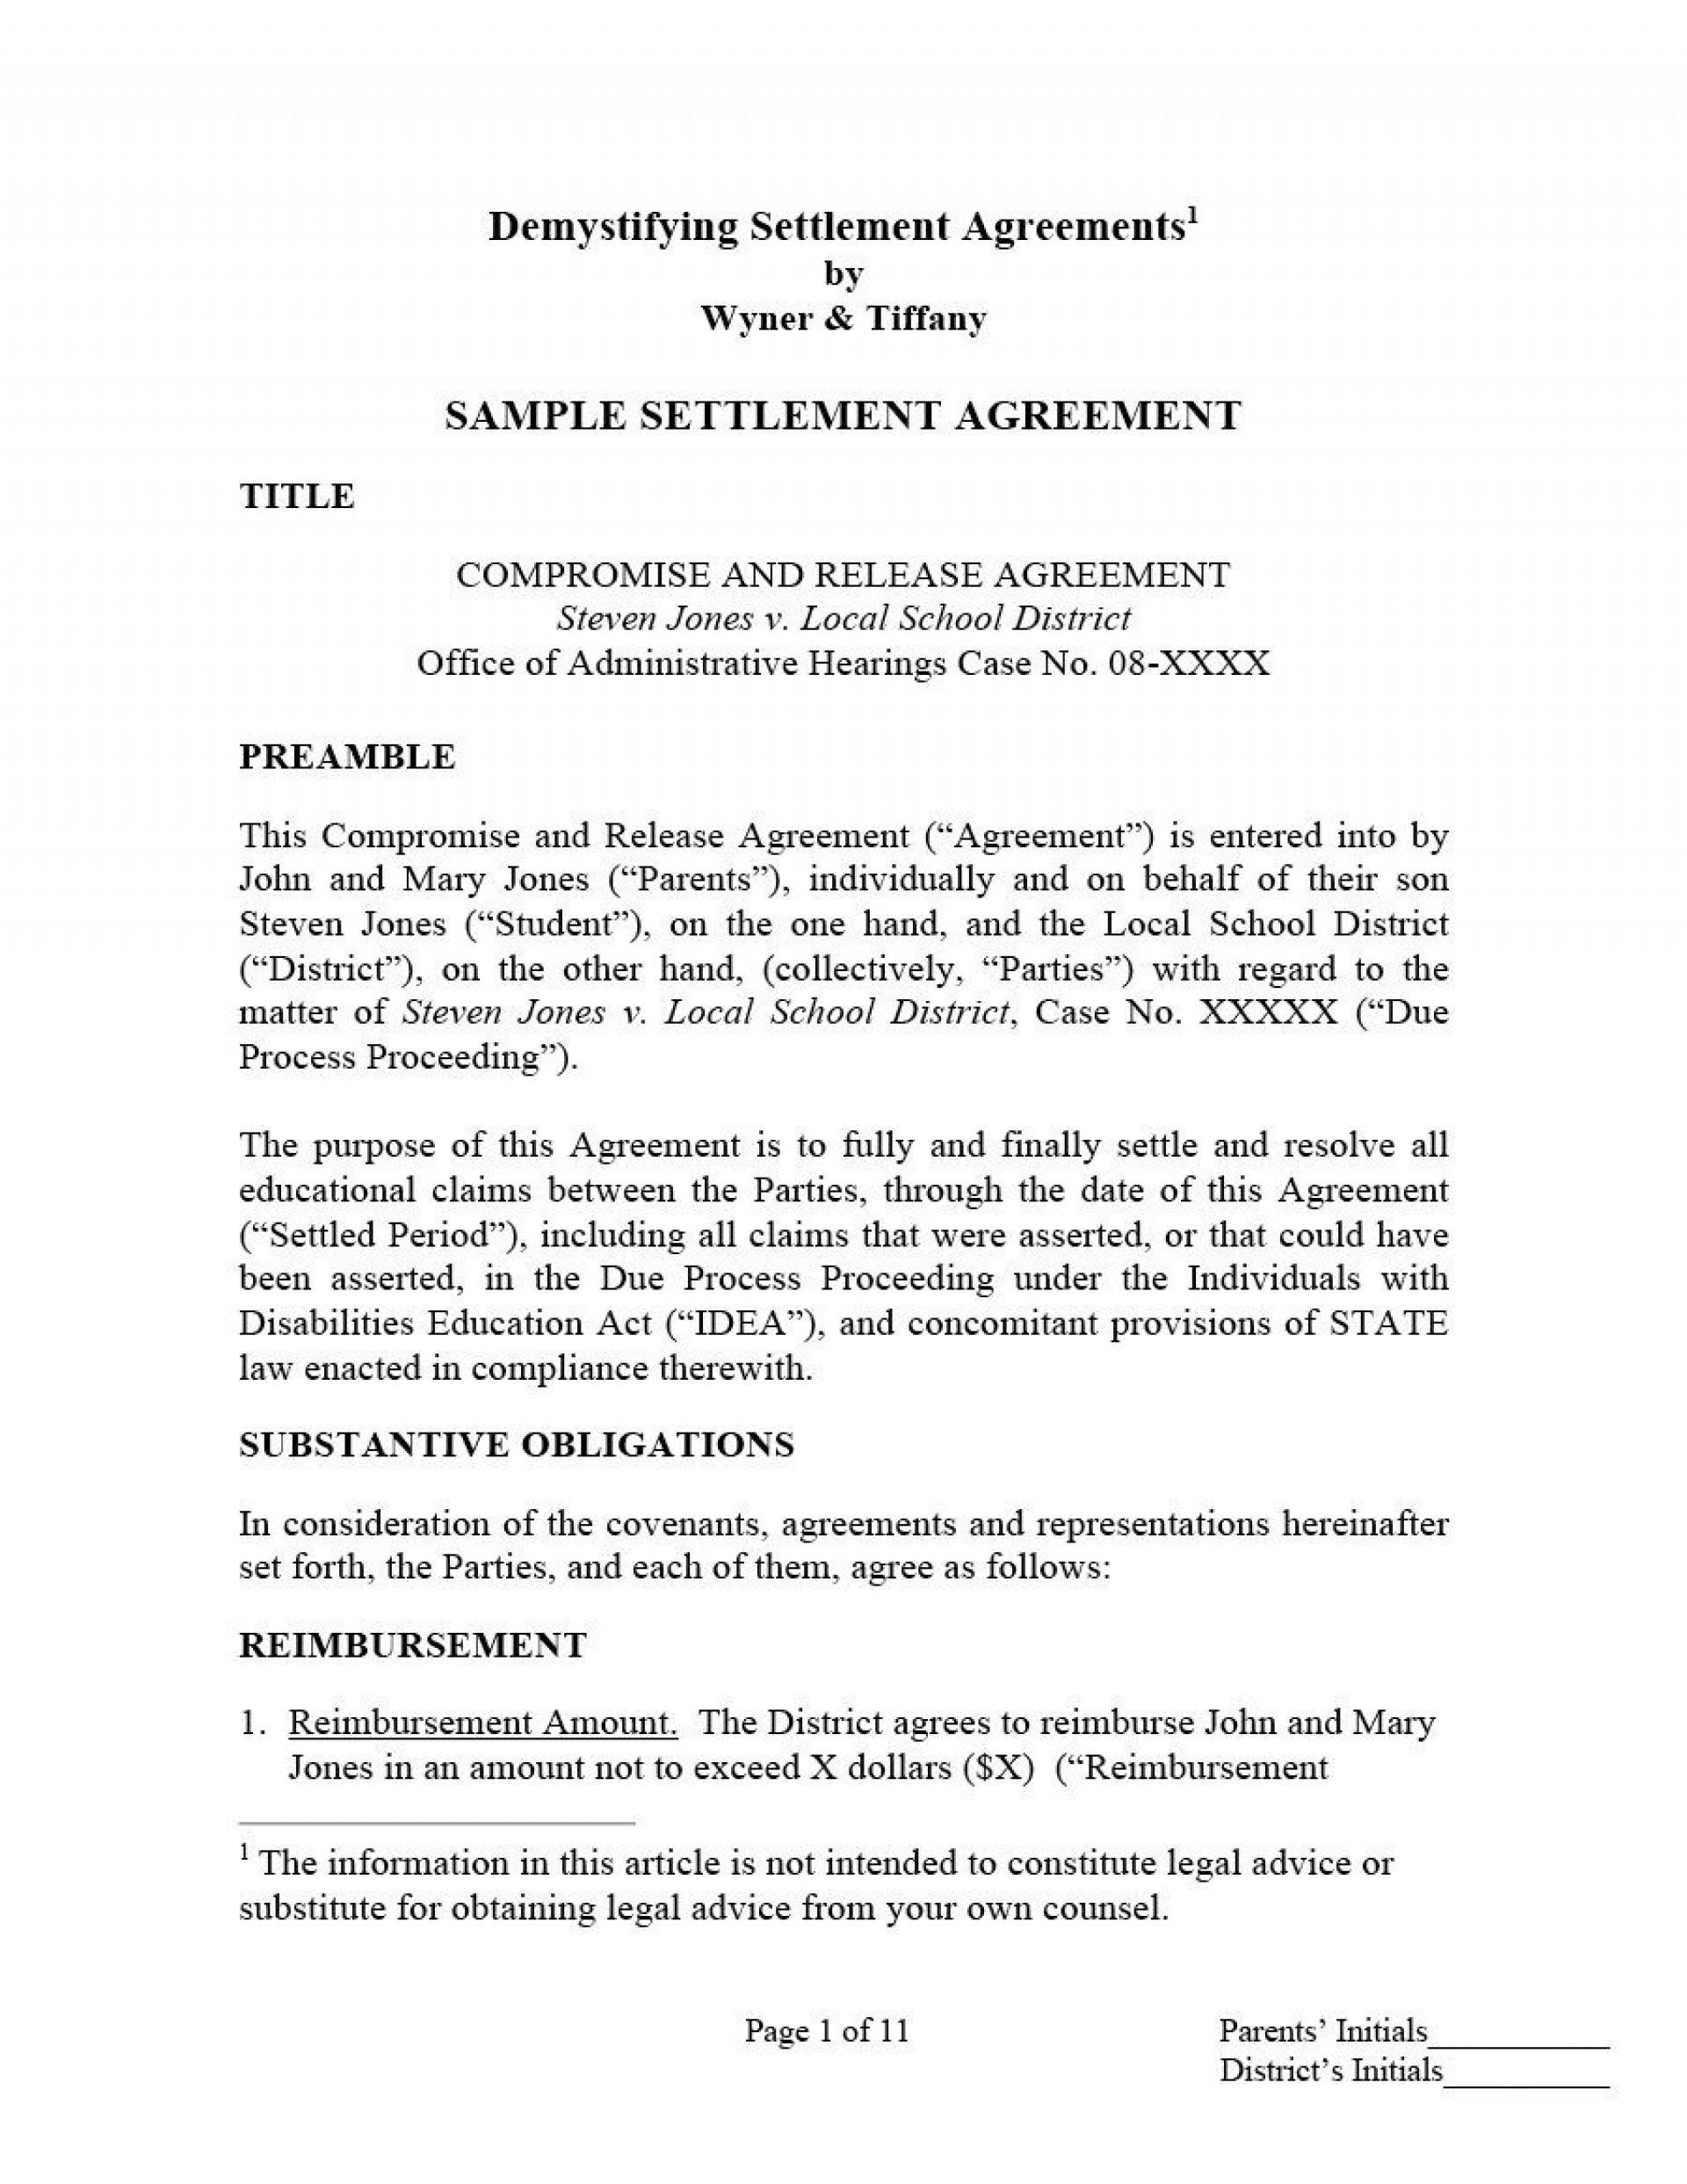 002 Wonderful Divorce Settlement Agreement Template Highest Clarity  Sample New York Marital Uk South Africa1920